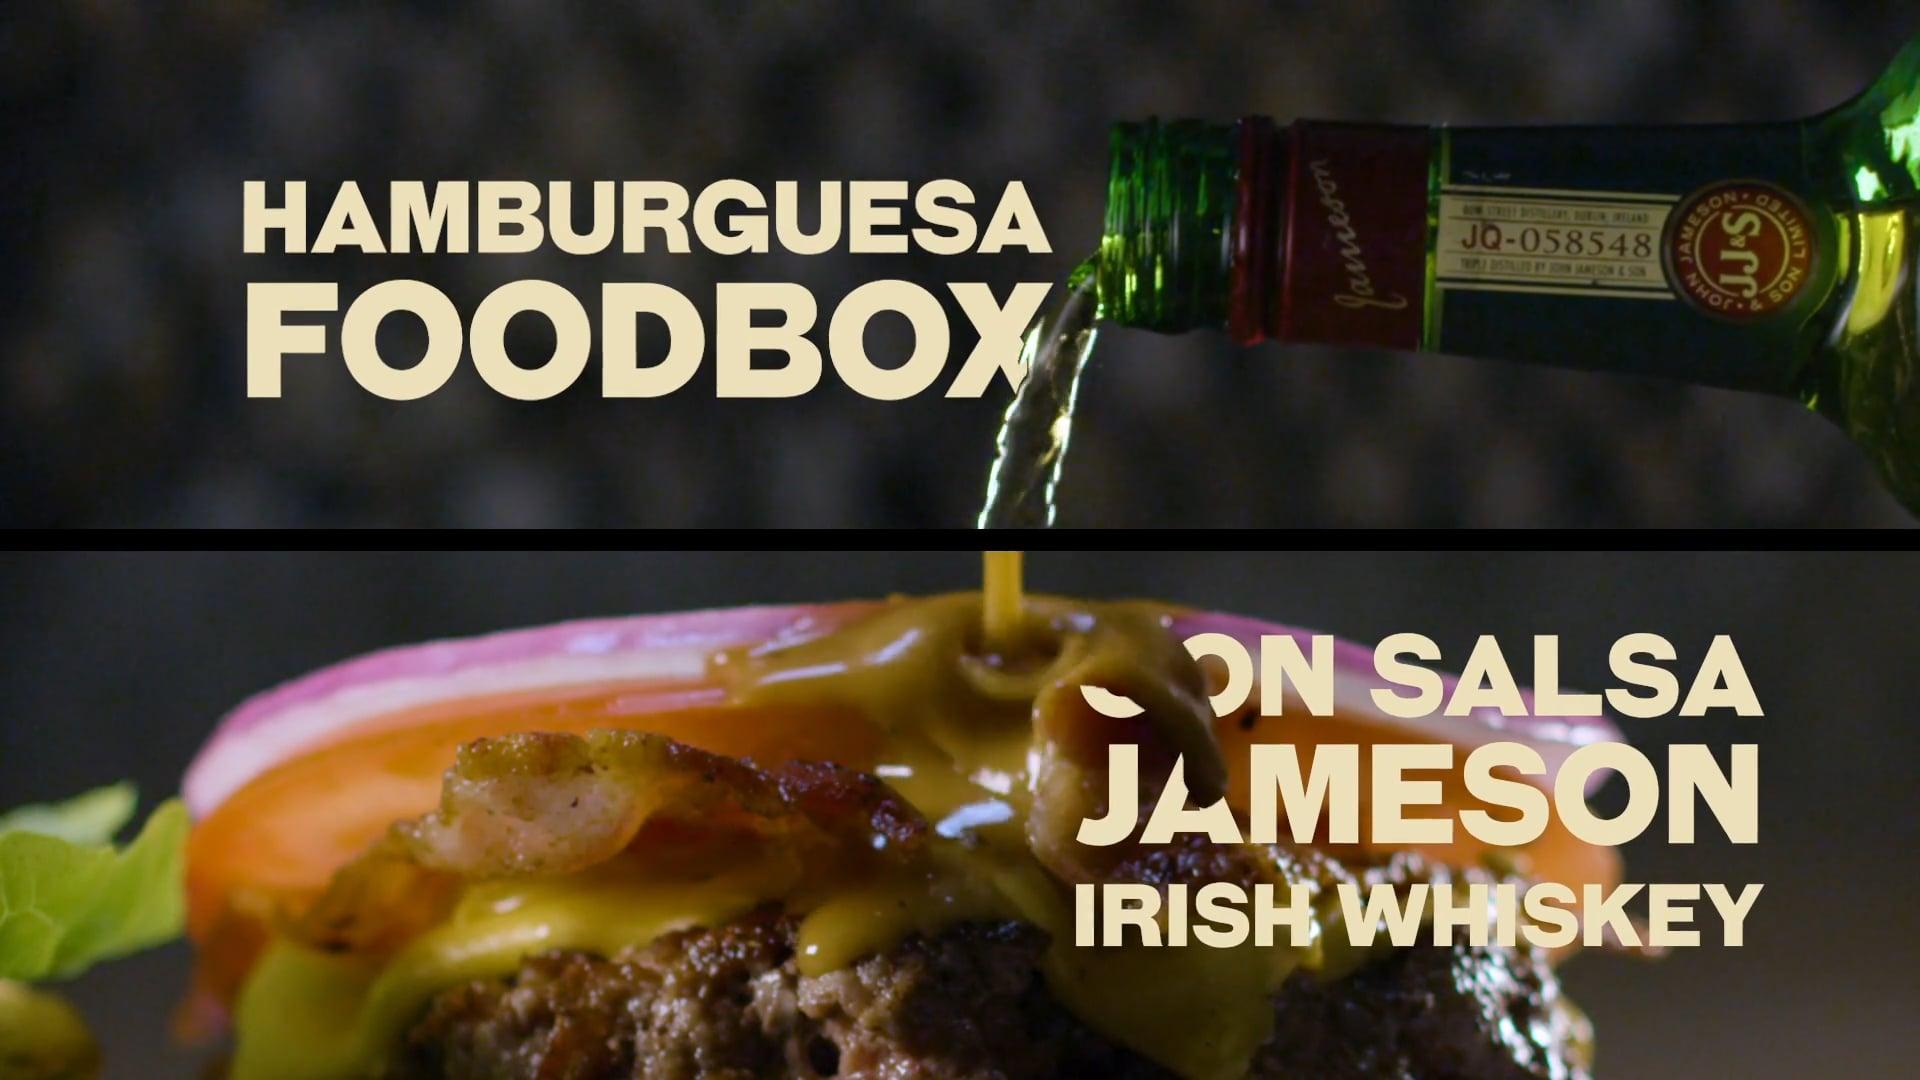 Jameson & Foodbox - Jameson Burger